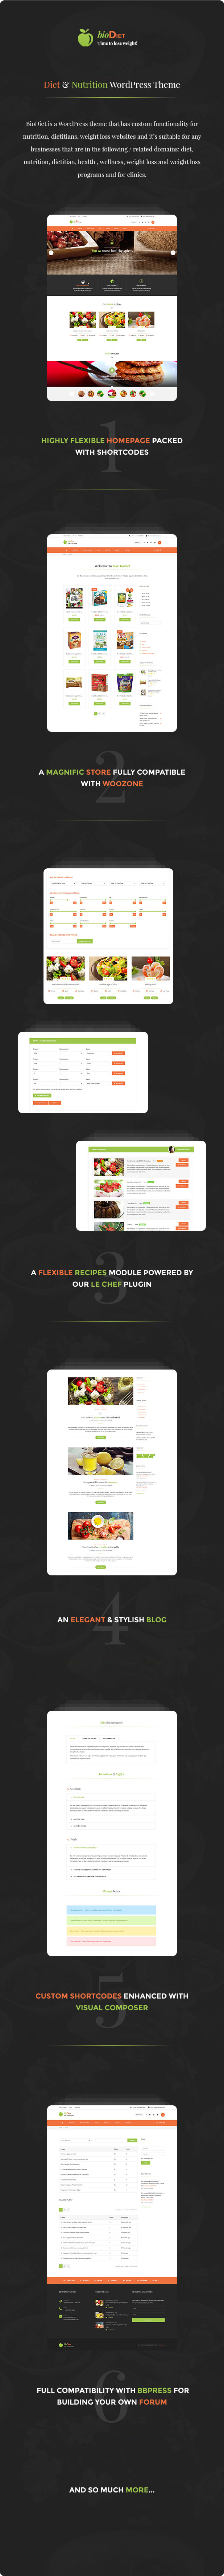 BioDiet - Nutrition & Weight Loss WordPress Theme - 2